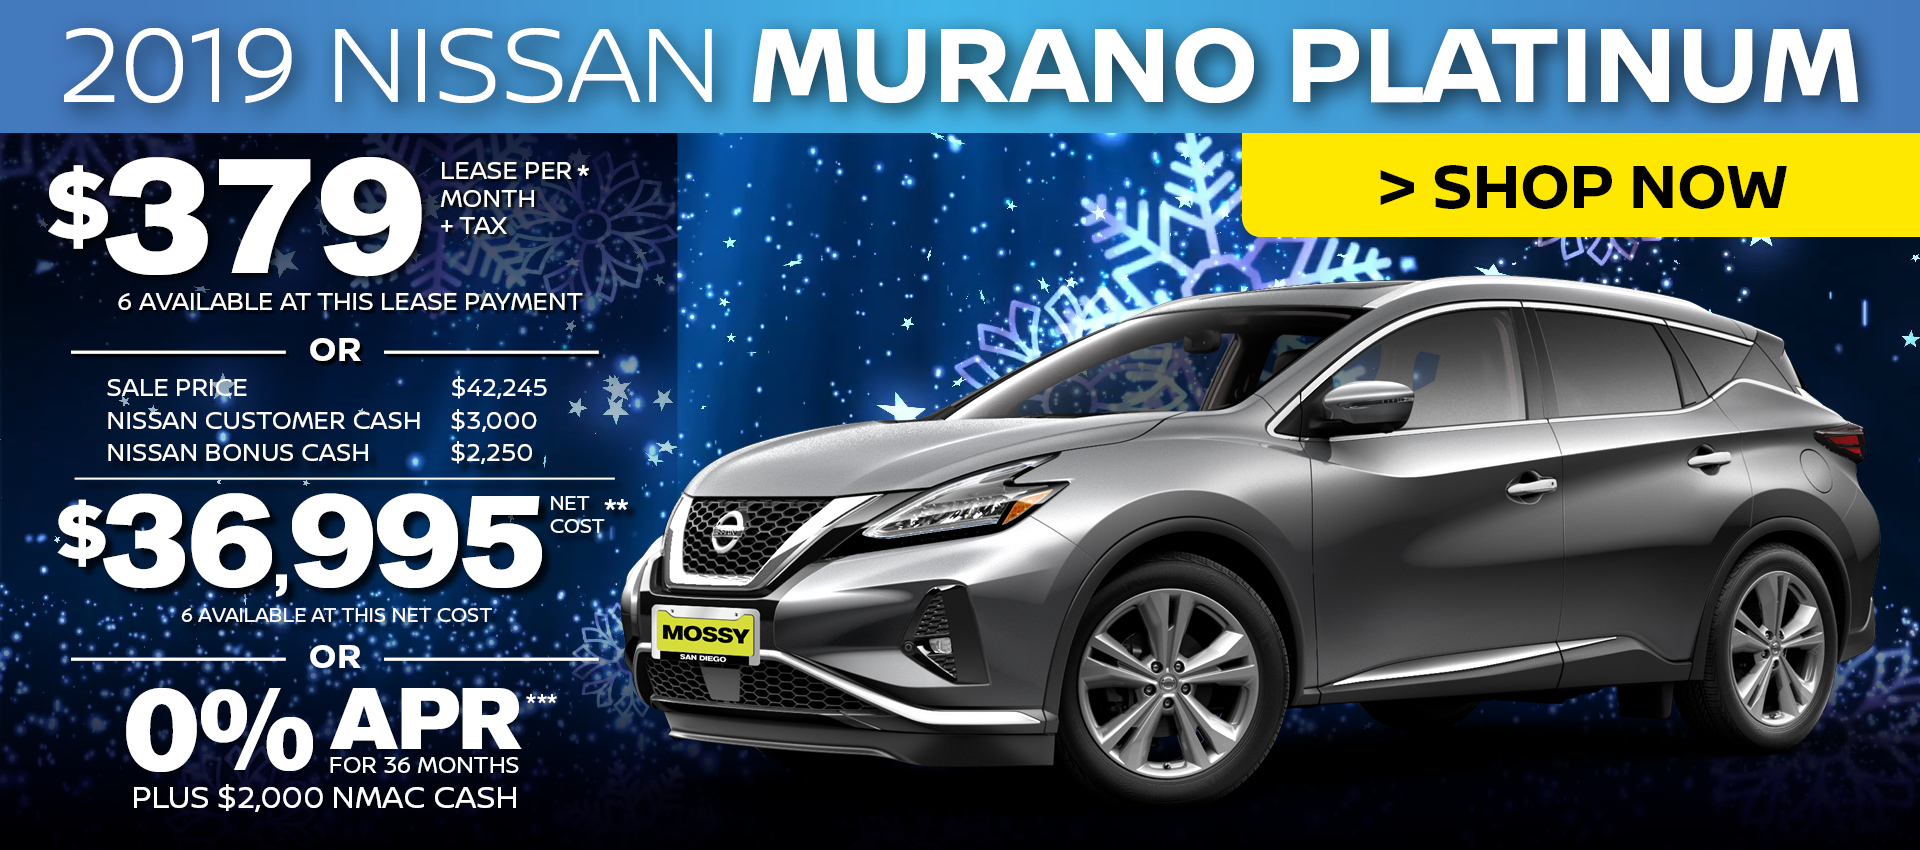 Mossy Nissan - Nissan Murano Platinum Purchase HP